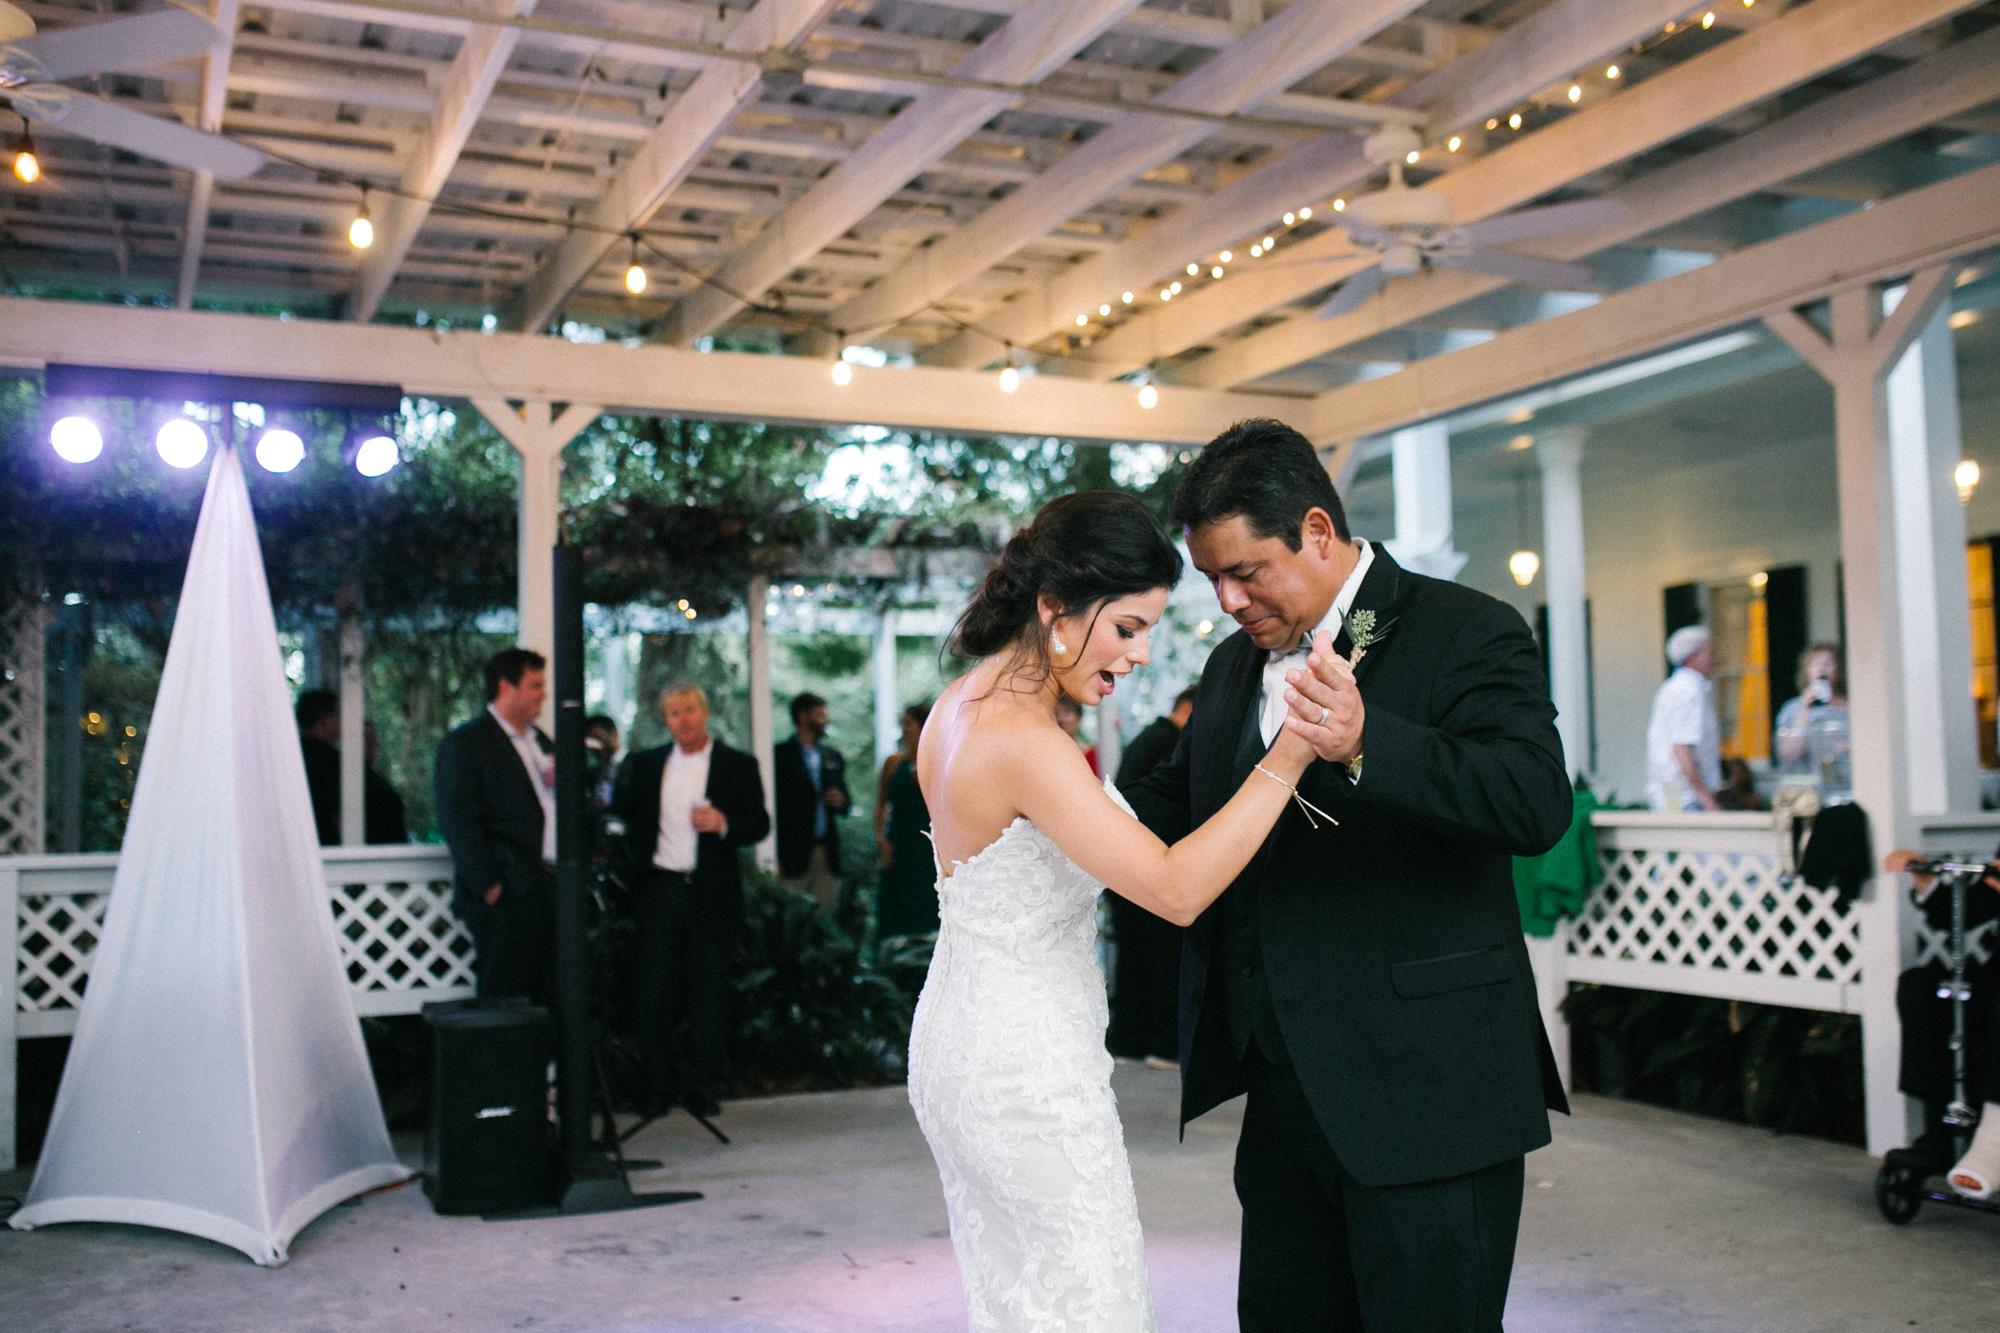 Gautier_Wedding_Photographer-176.jpg